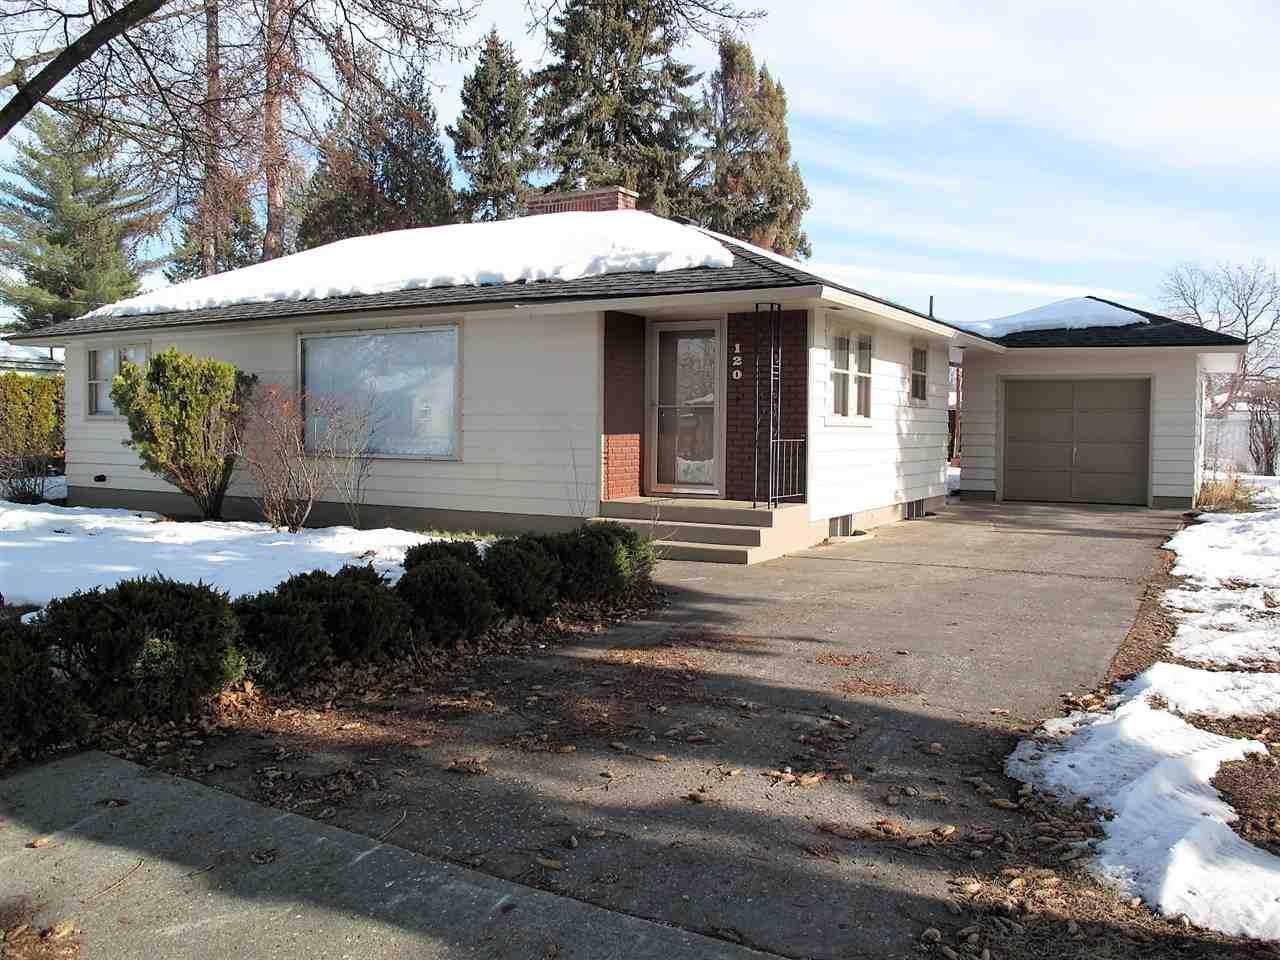 120 N Bolivar Rd, Spokane Valley, WA 99216